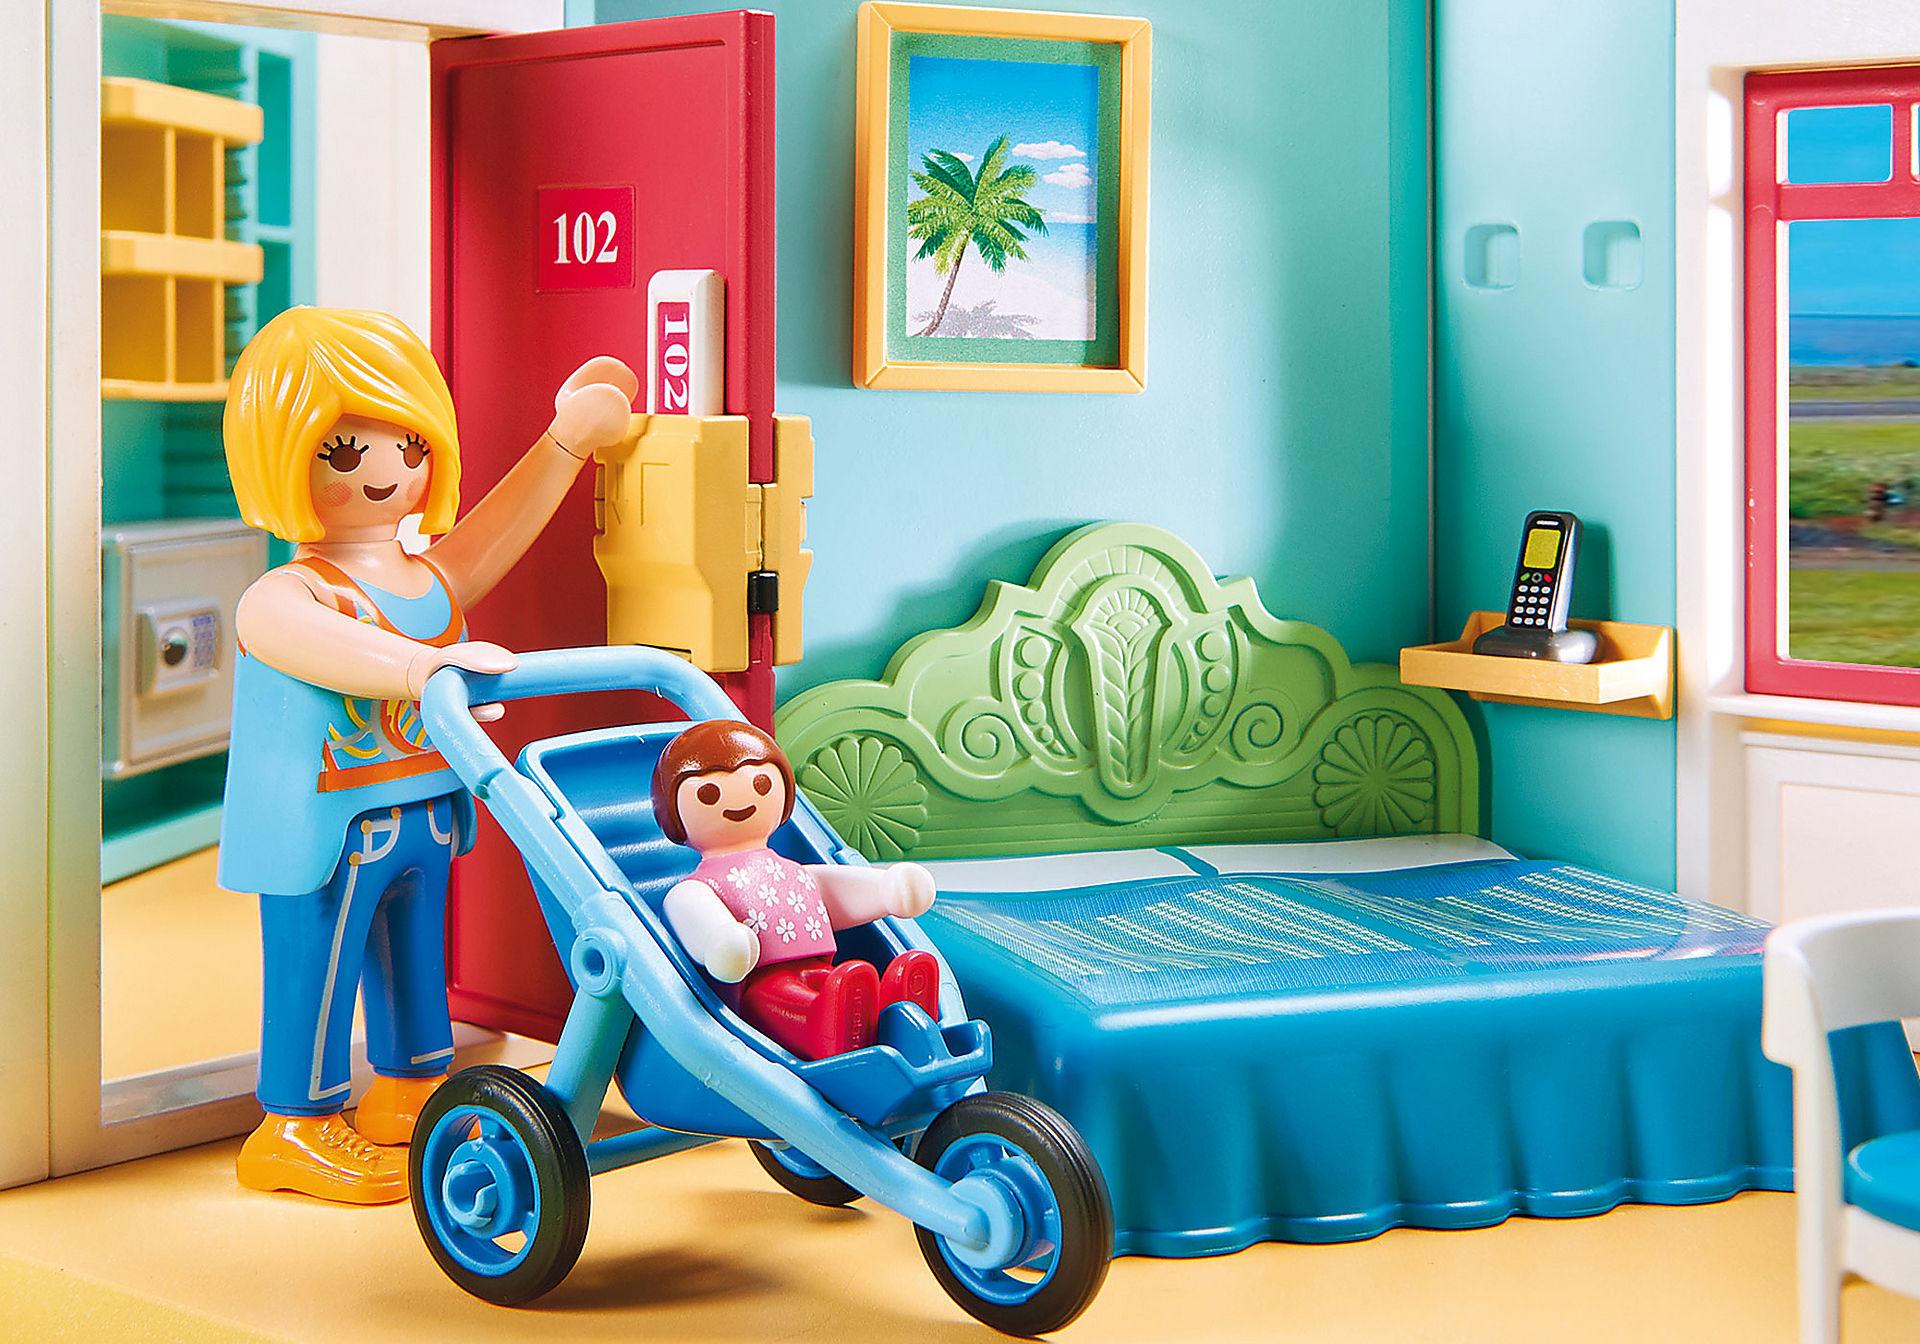 9539 Playmobil Inn zoom image6